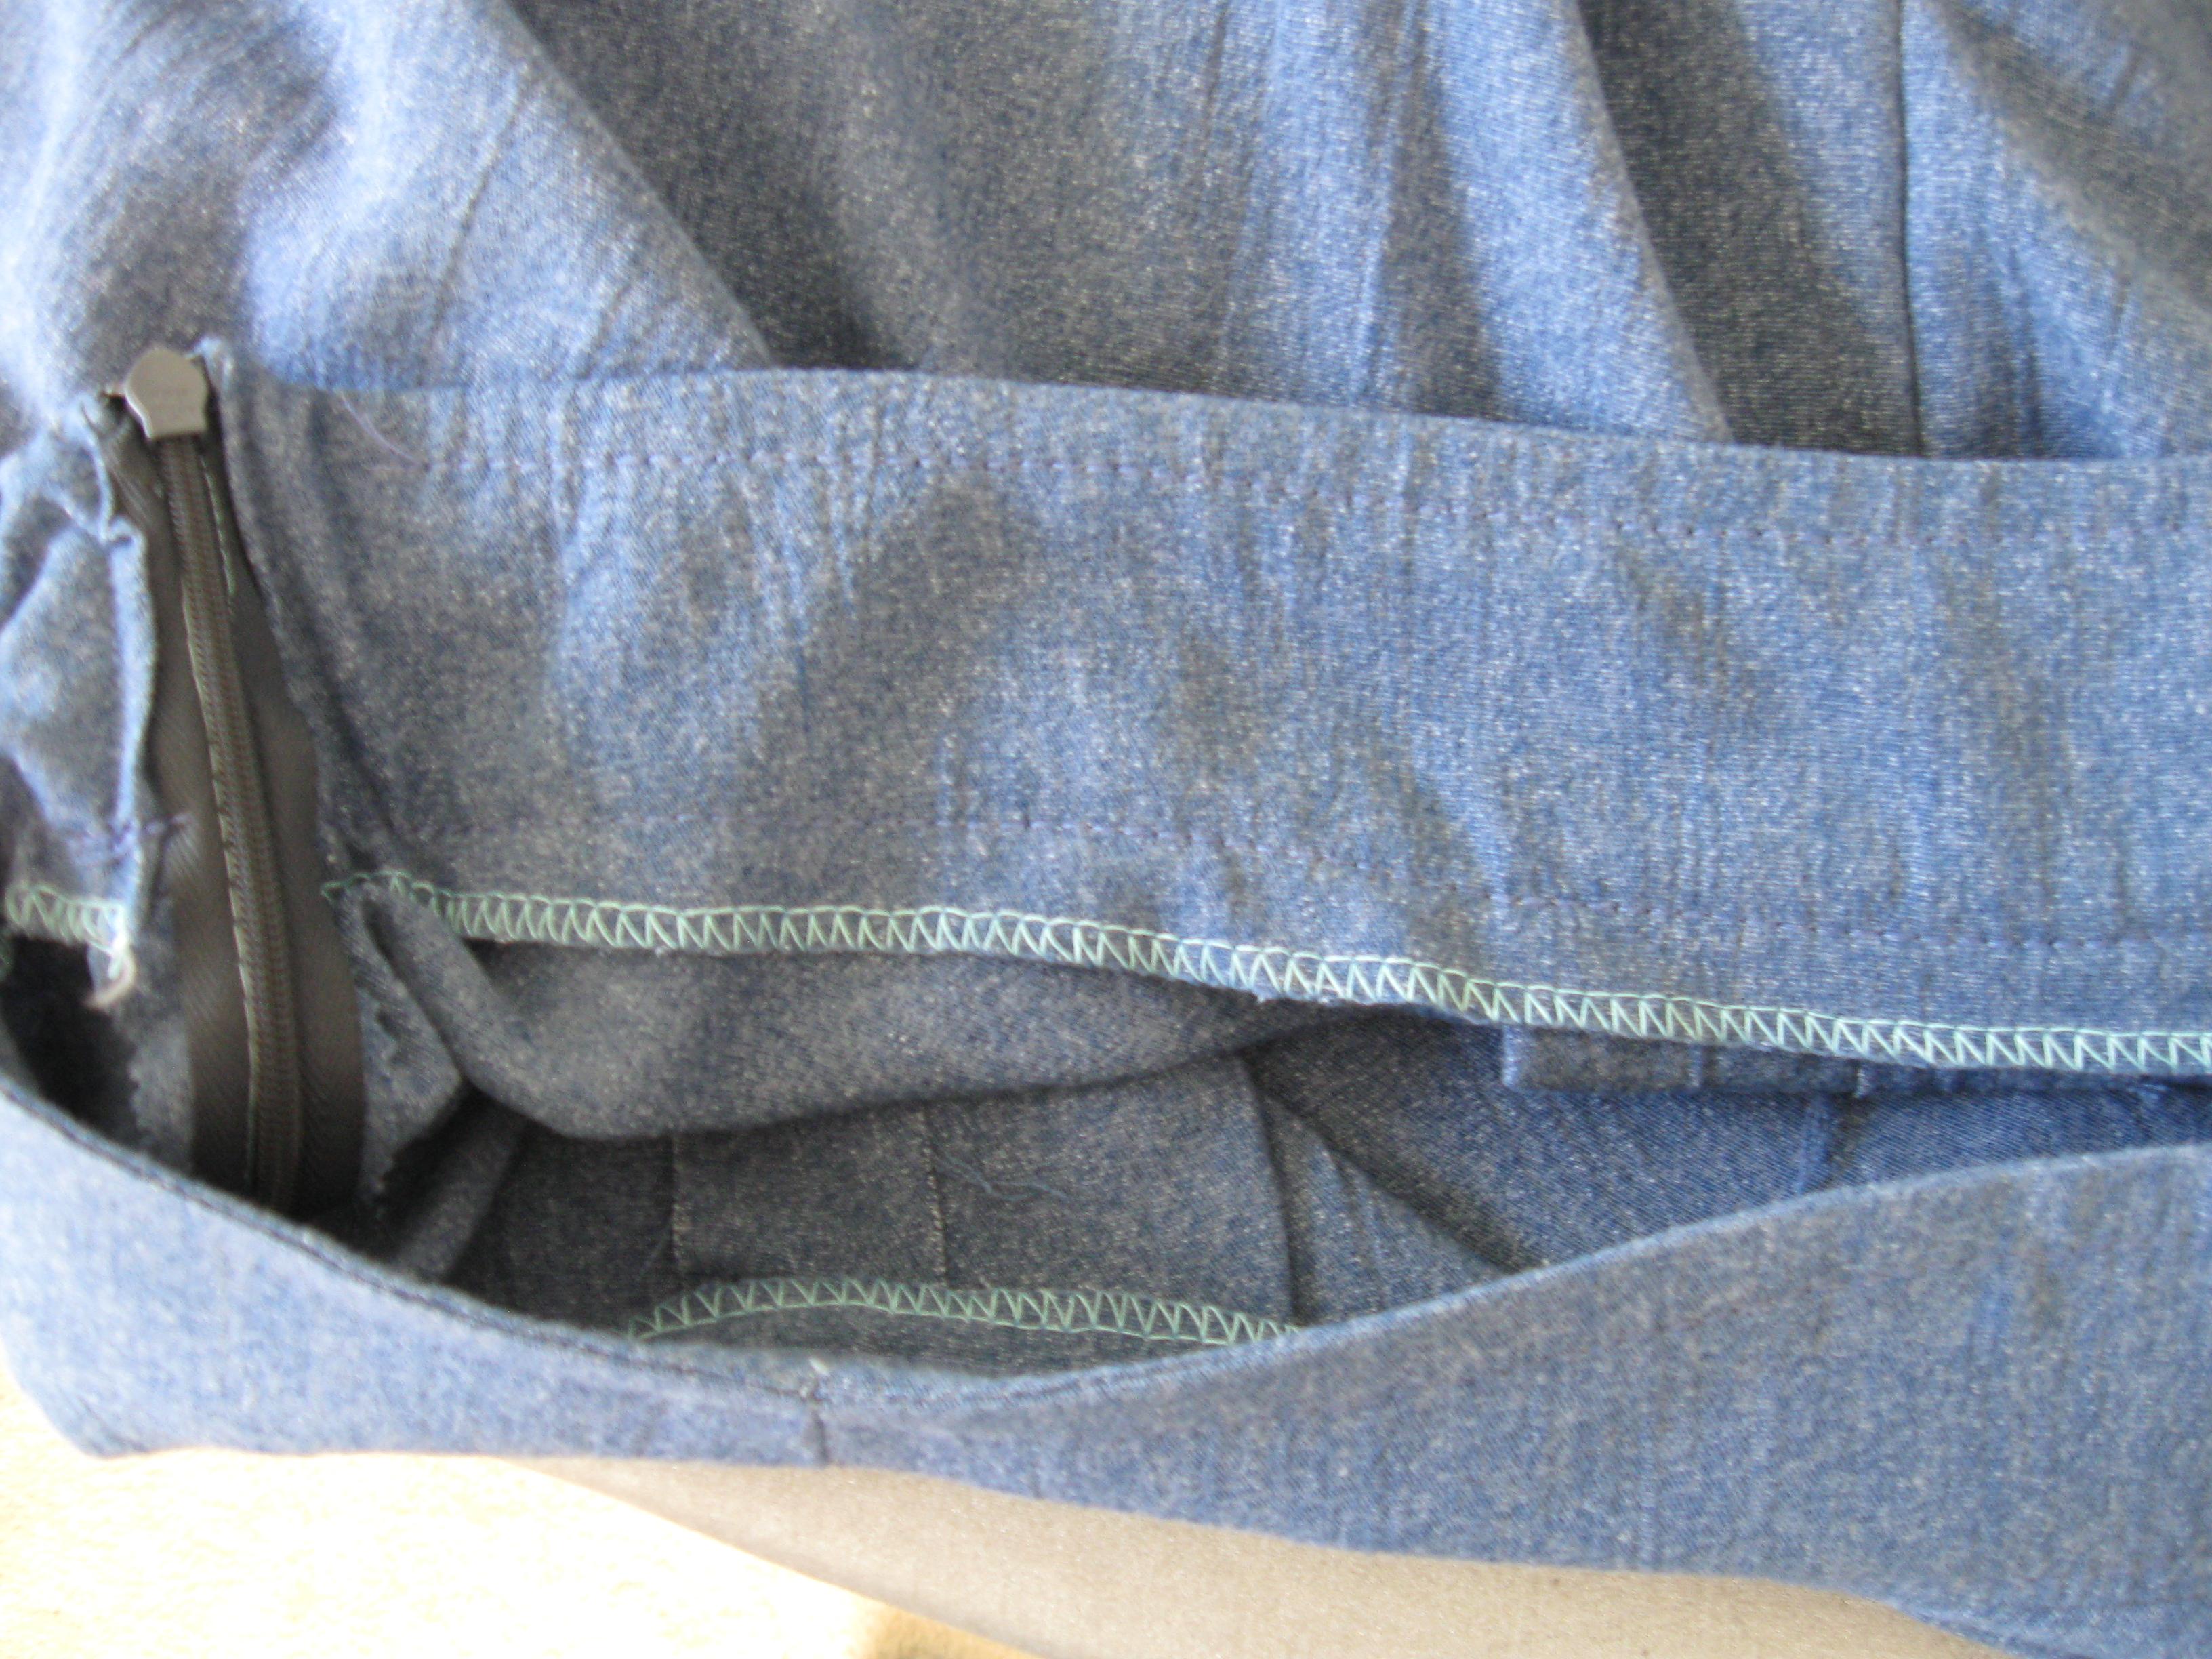 culotte waistband inside